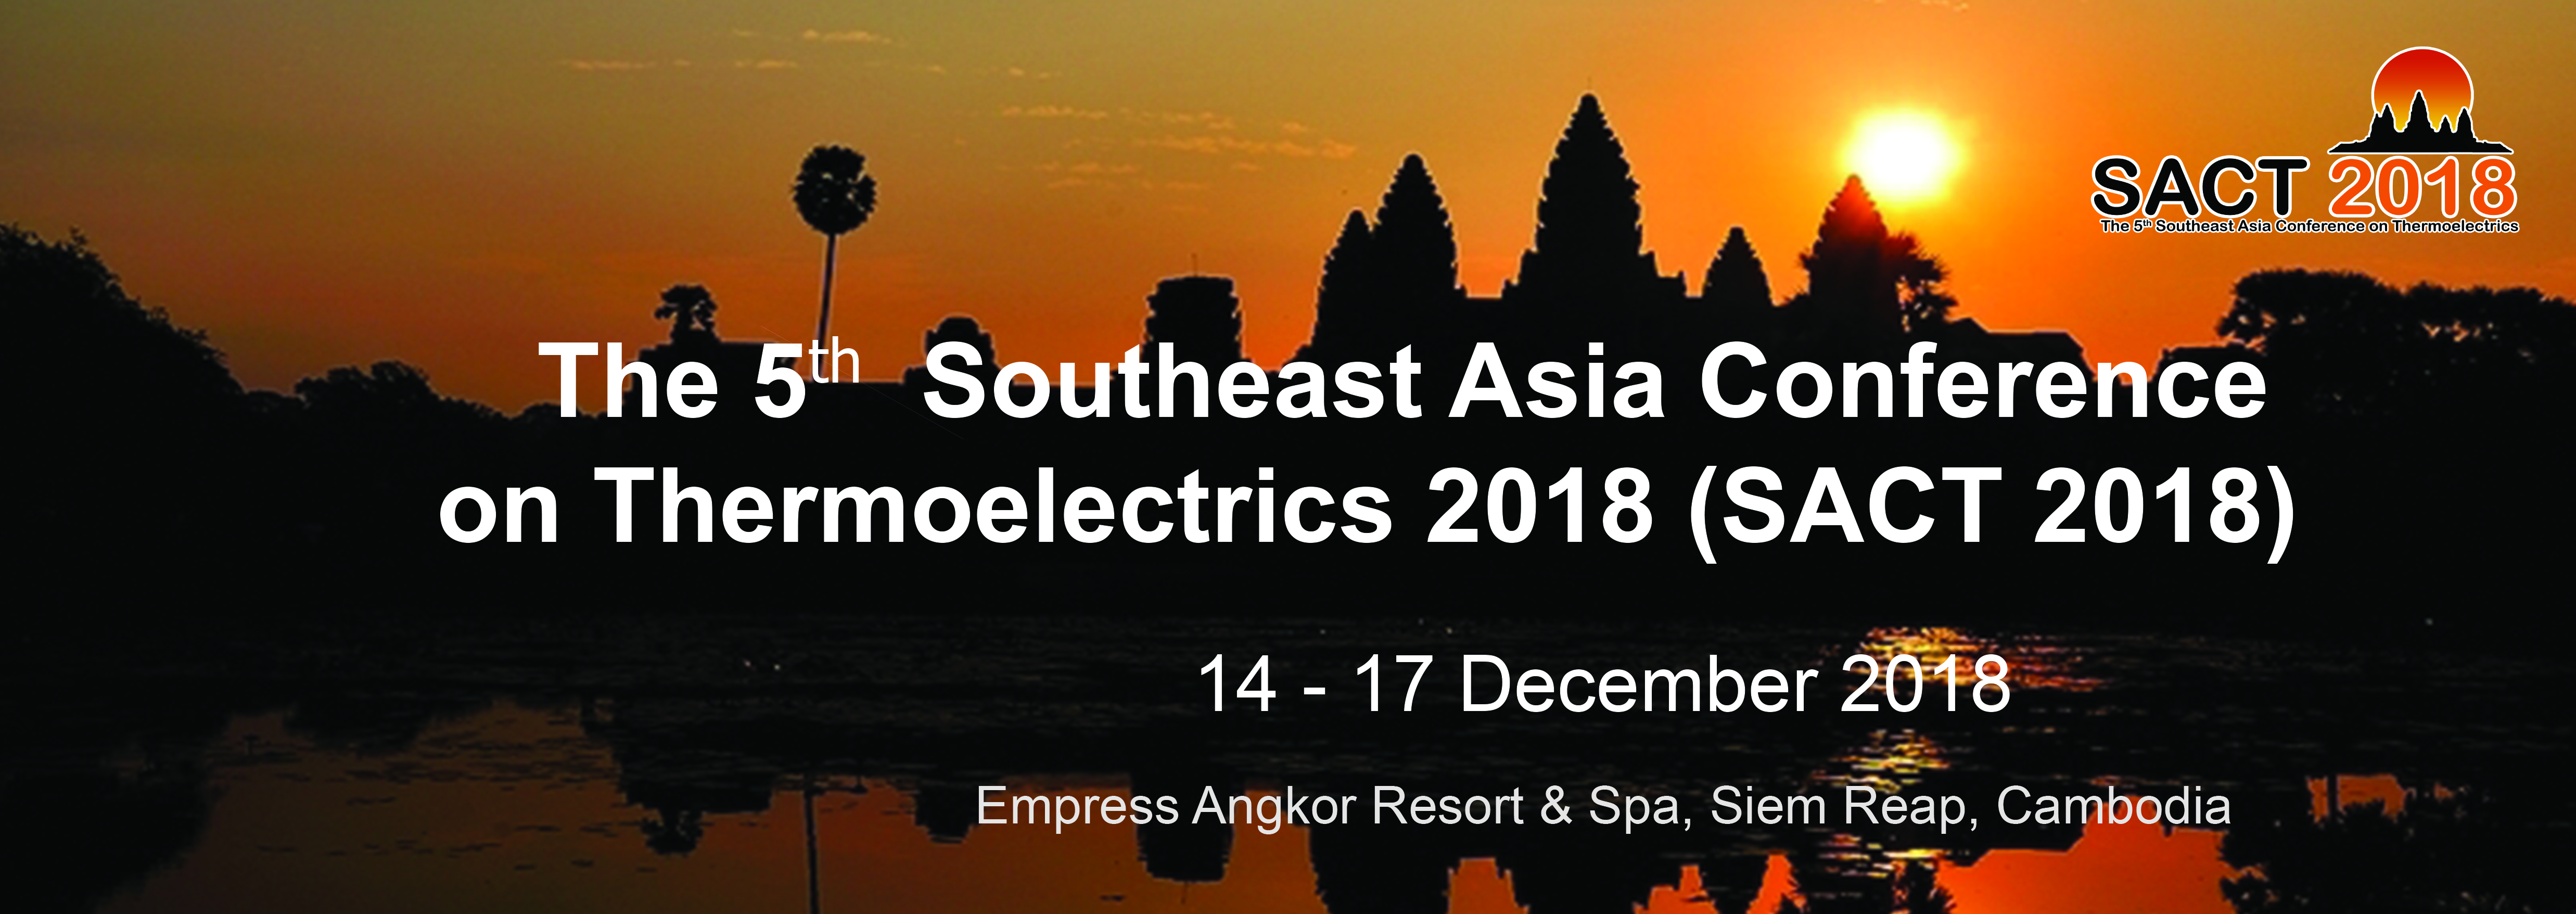 Conference Venue :Empress Angkor Resort & Spa, Siem Reap, Cambodia